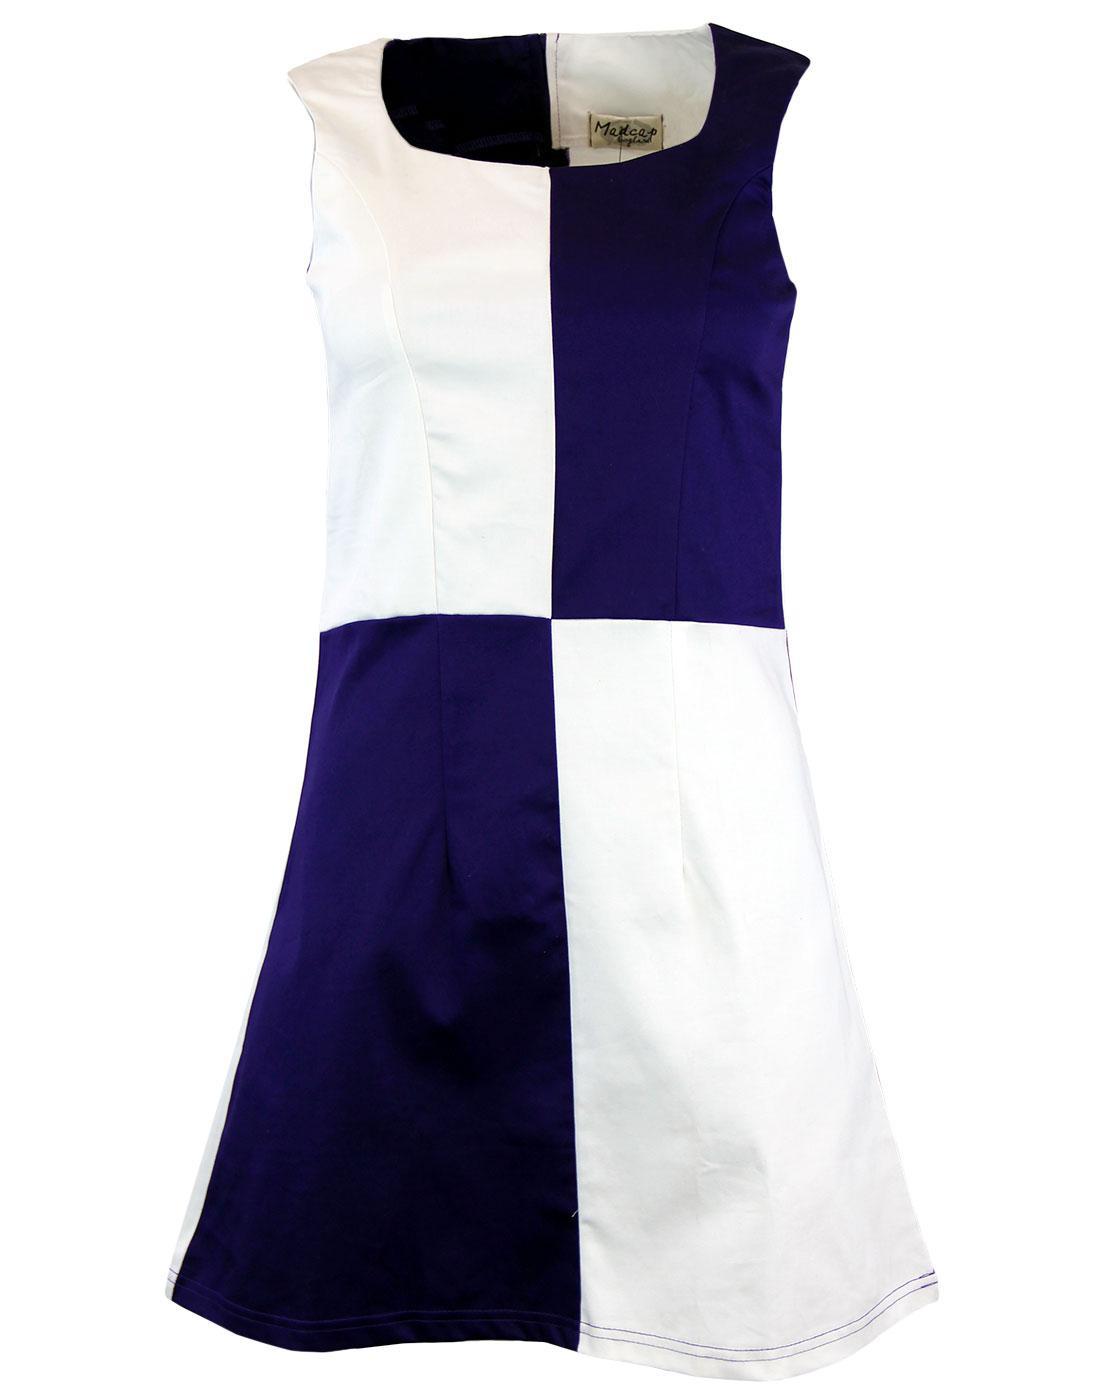 'The Chelsea Set' - Retro Sixties Mini Dress (P/W)